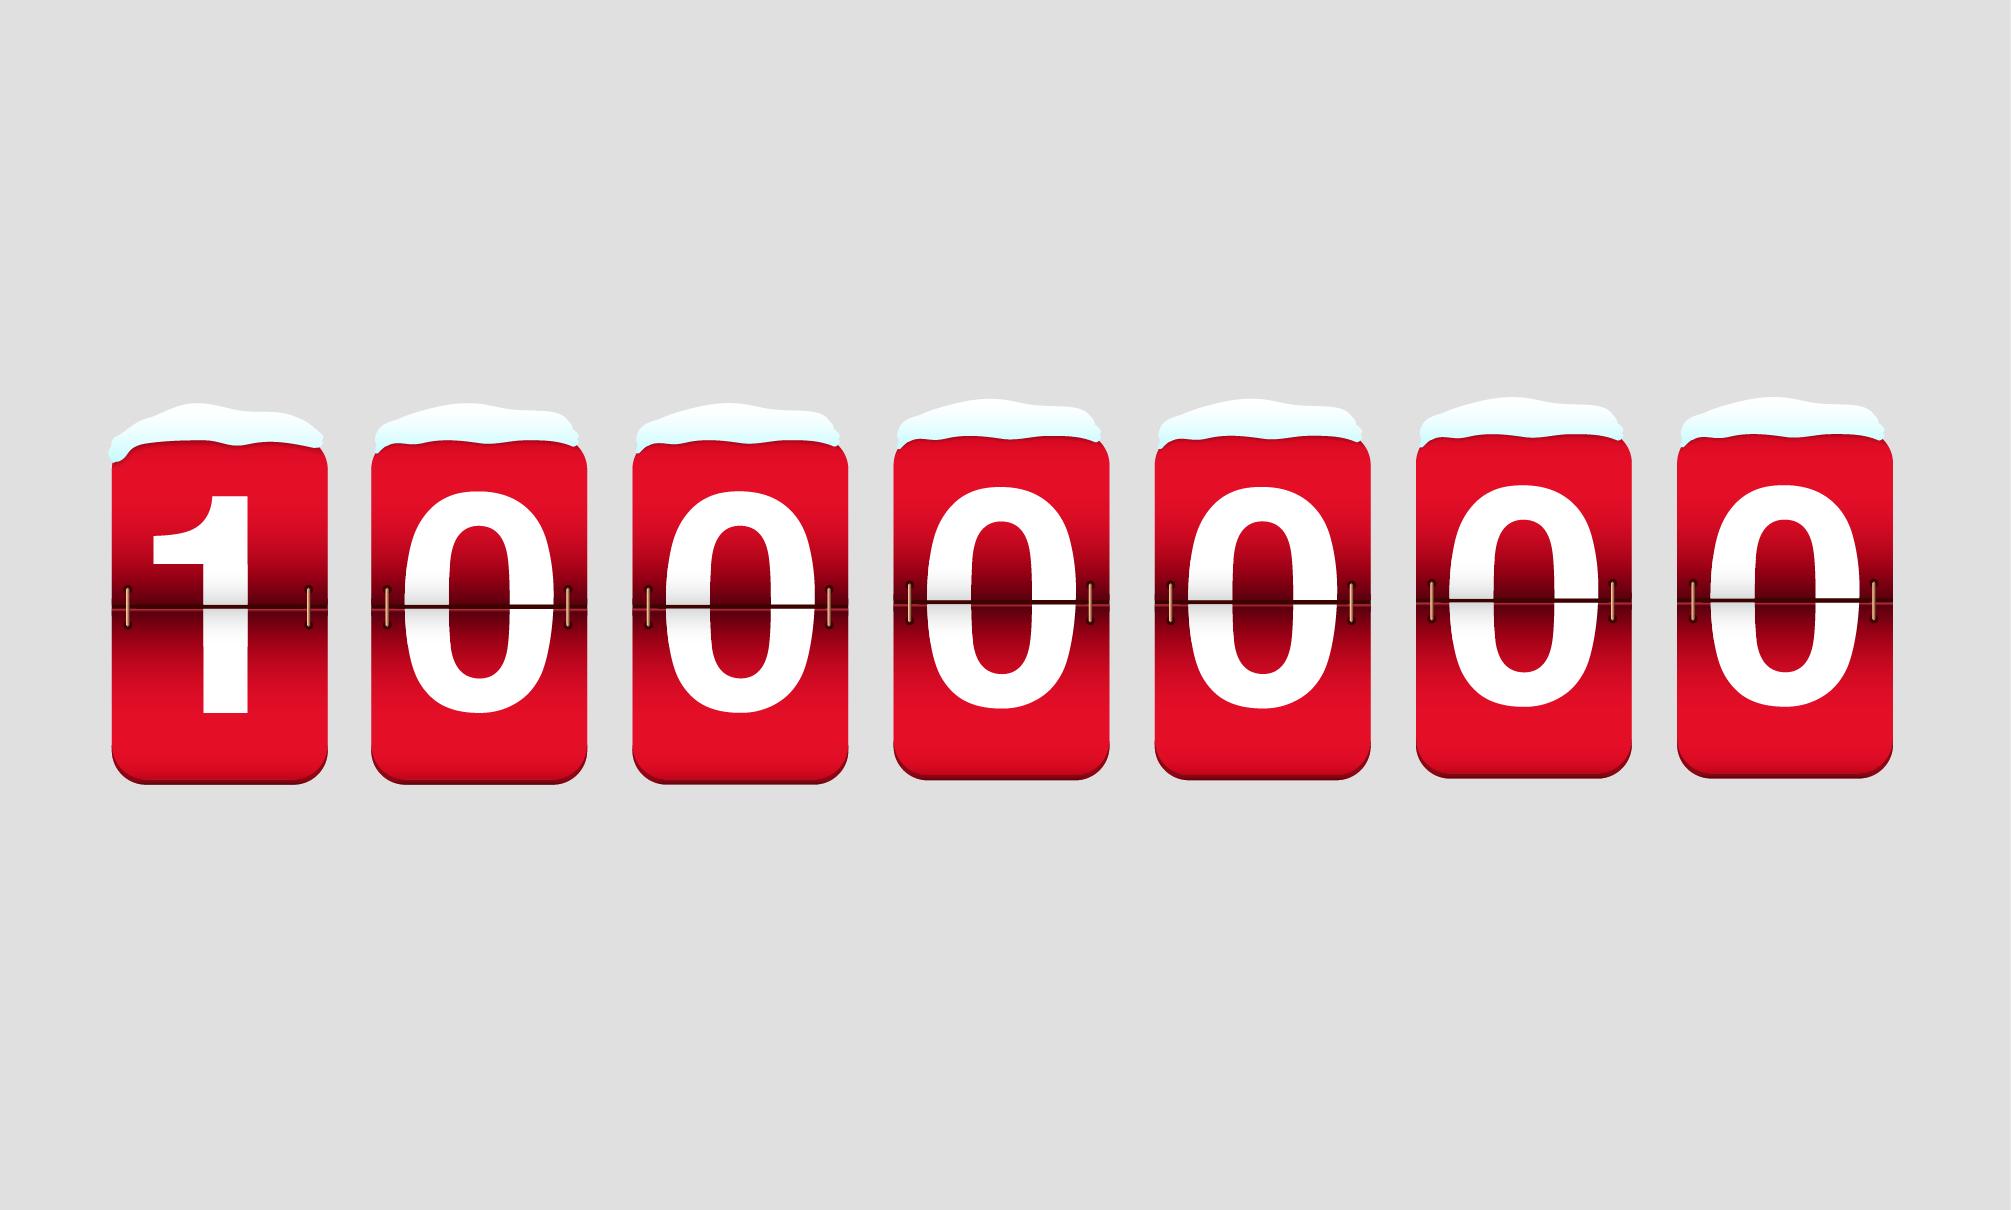 1.000.000 Pfeile